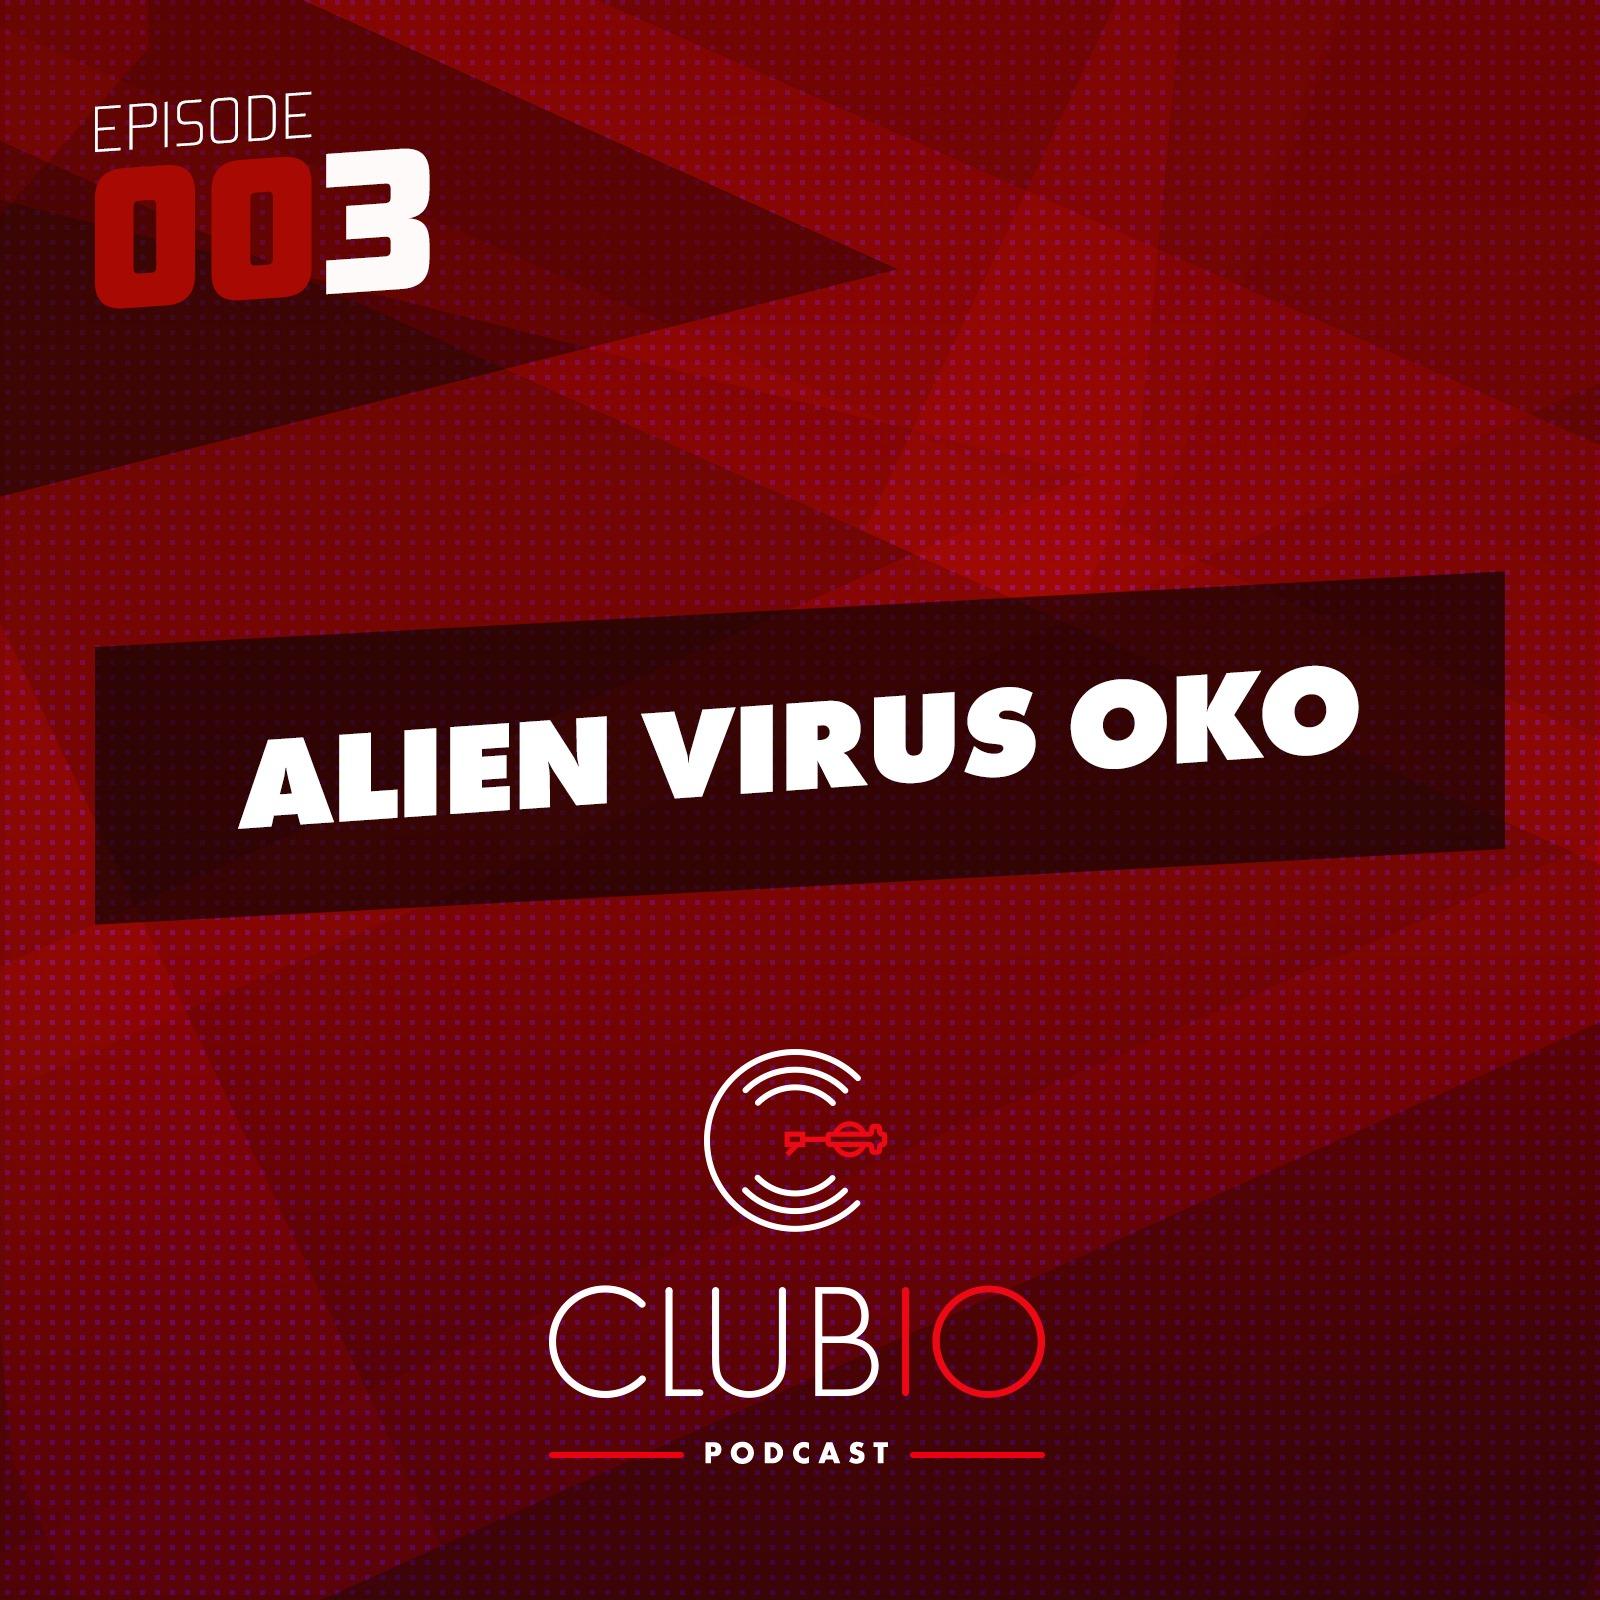 Clubio Podcast 003 - Alien Virus Oko